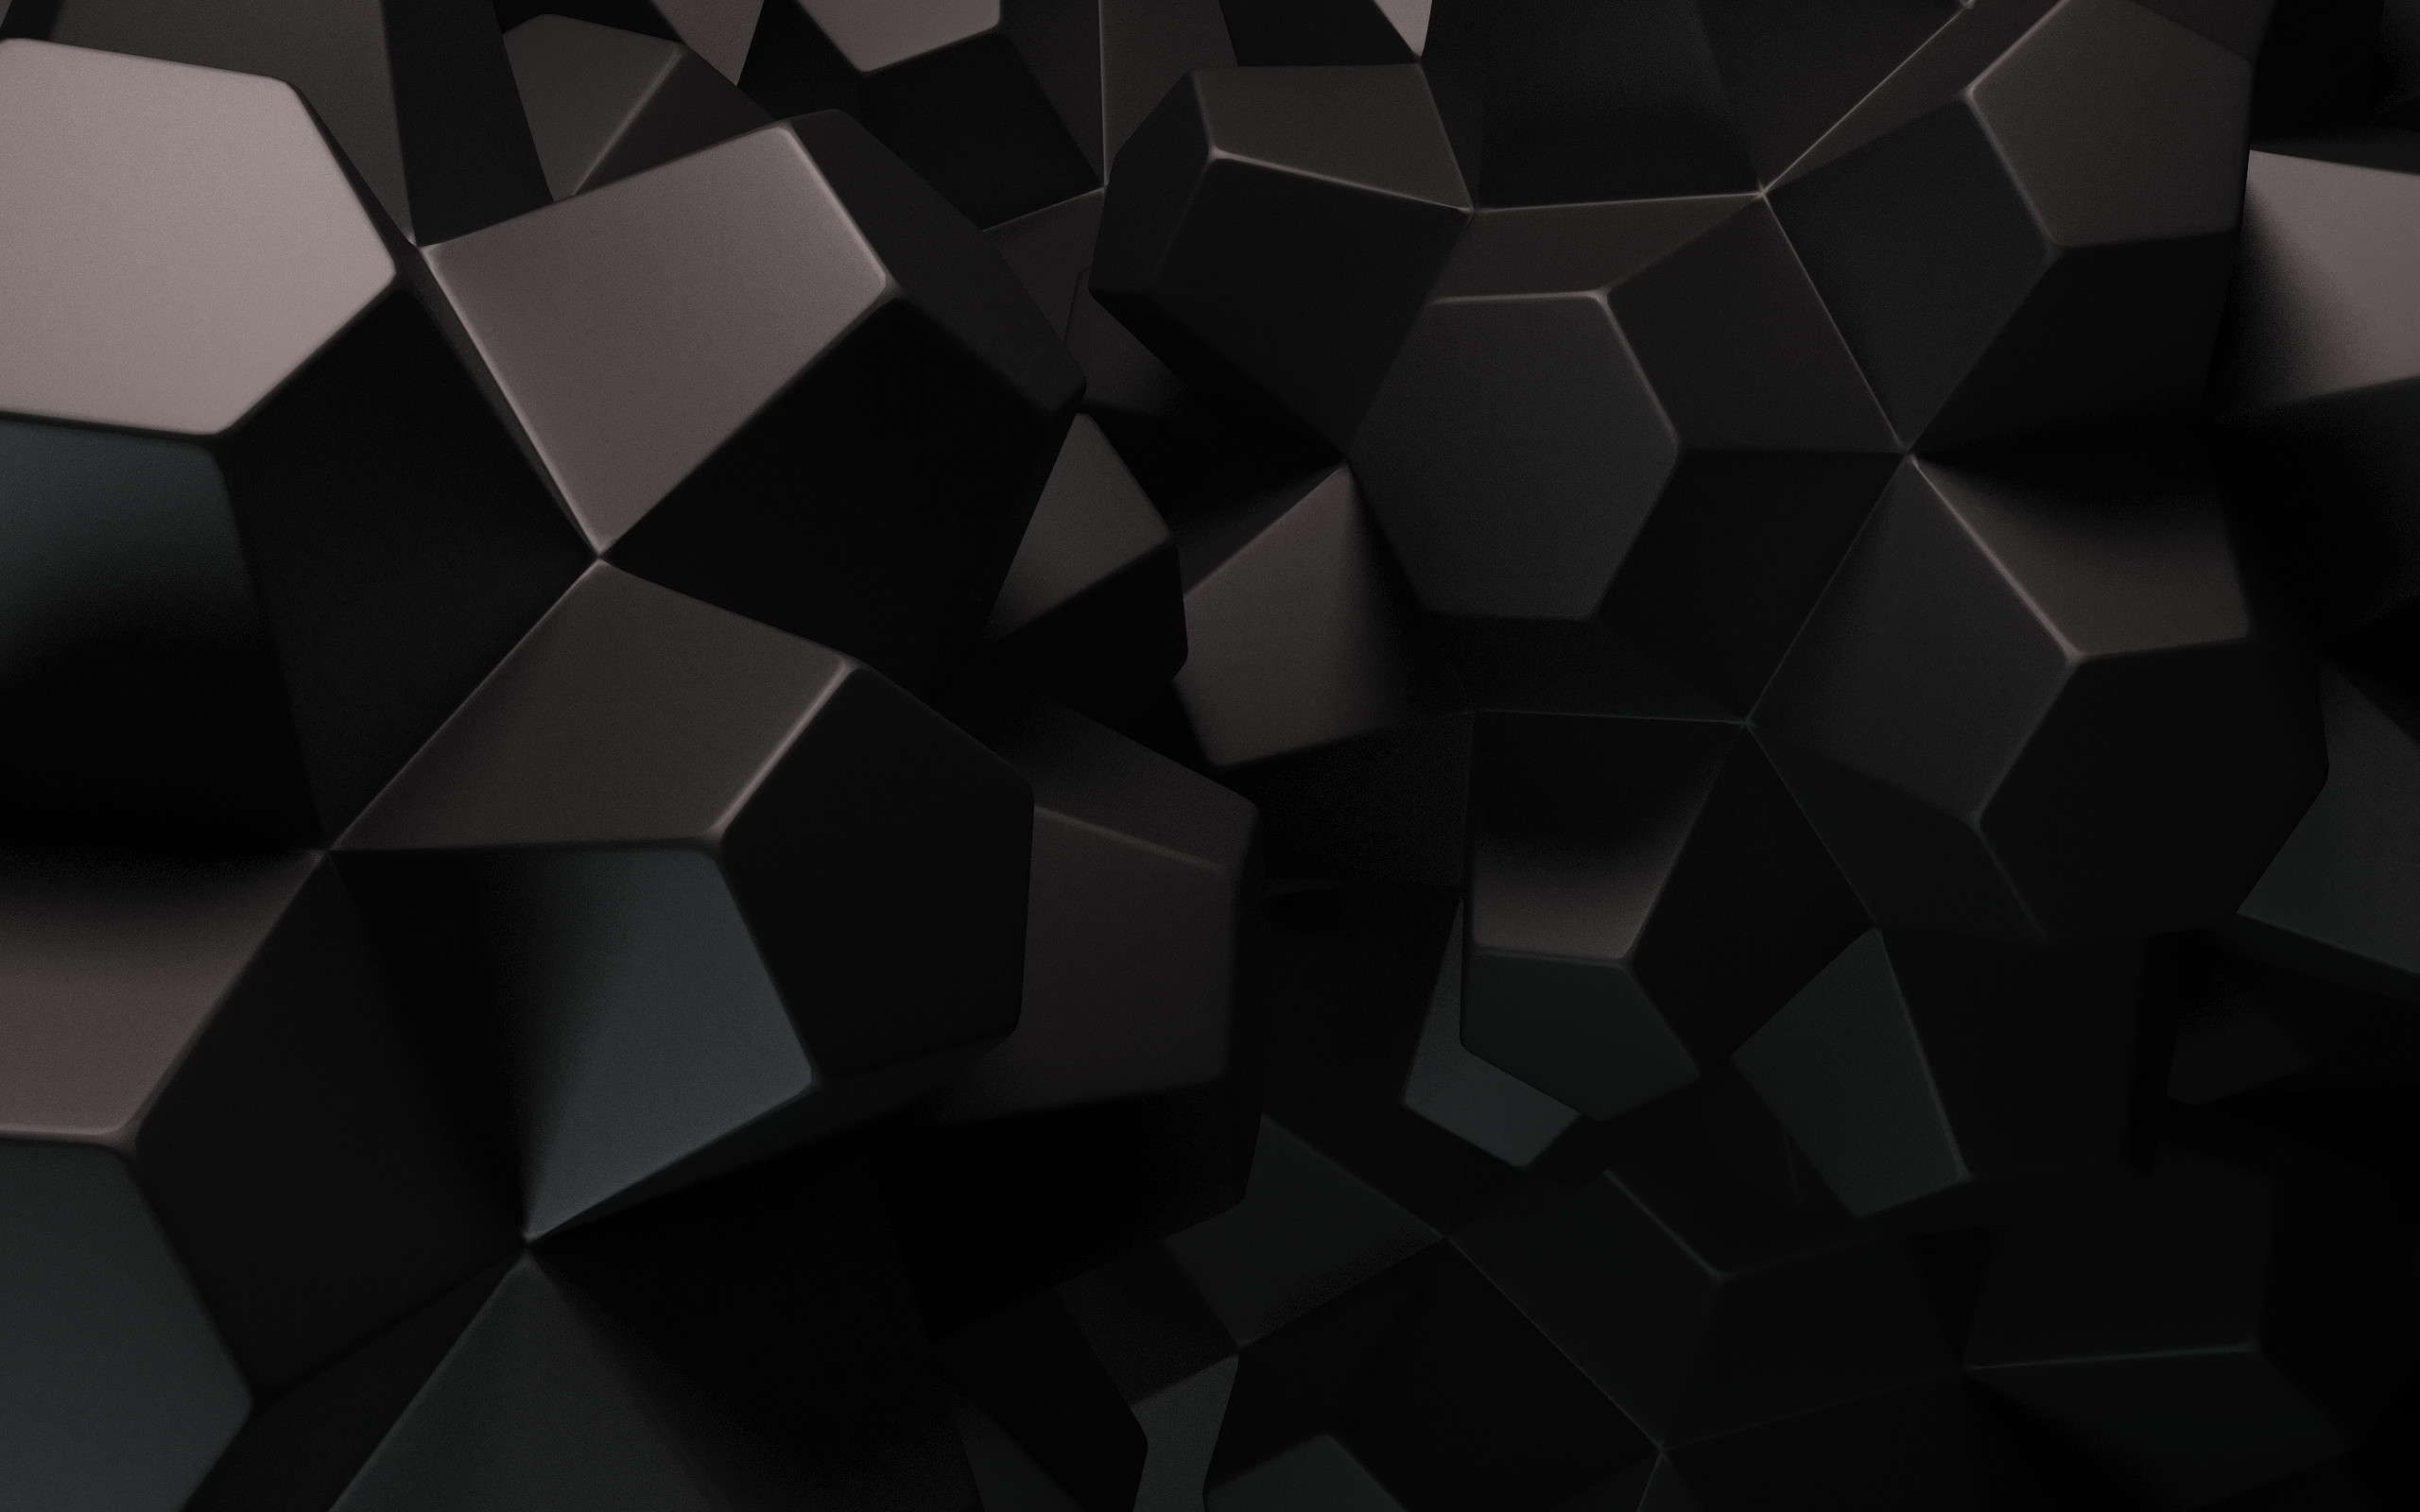 Res: 2560x1600, Hexagon converted wallpapers - 27 Hexagon wallpapers - most converted Hexagon  wallpapers